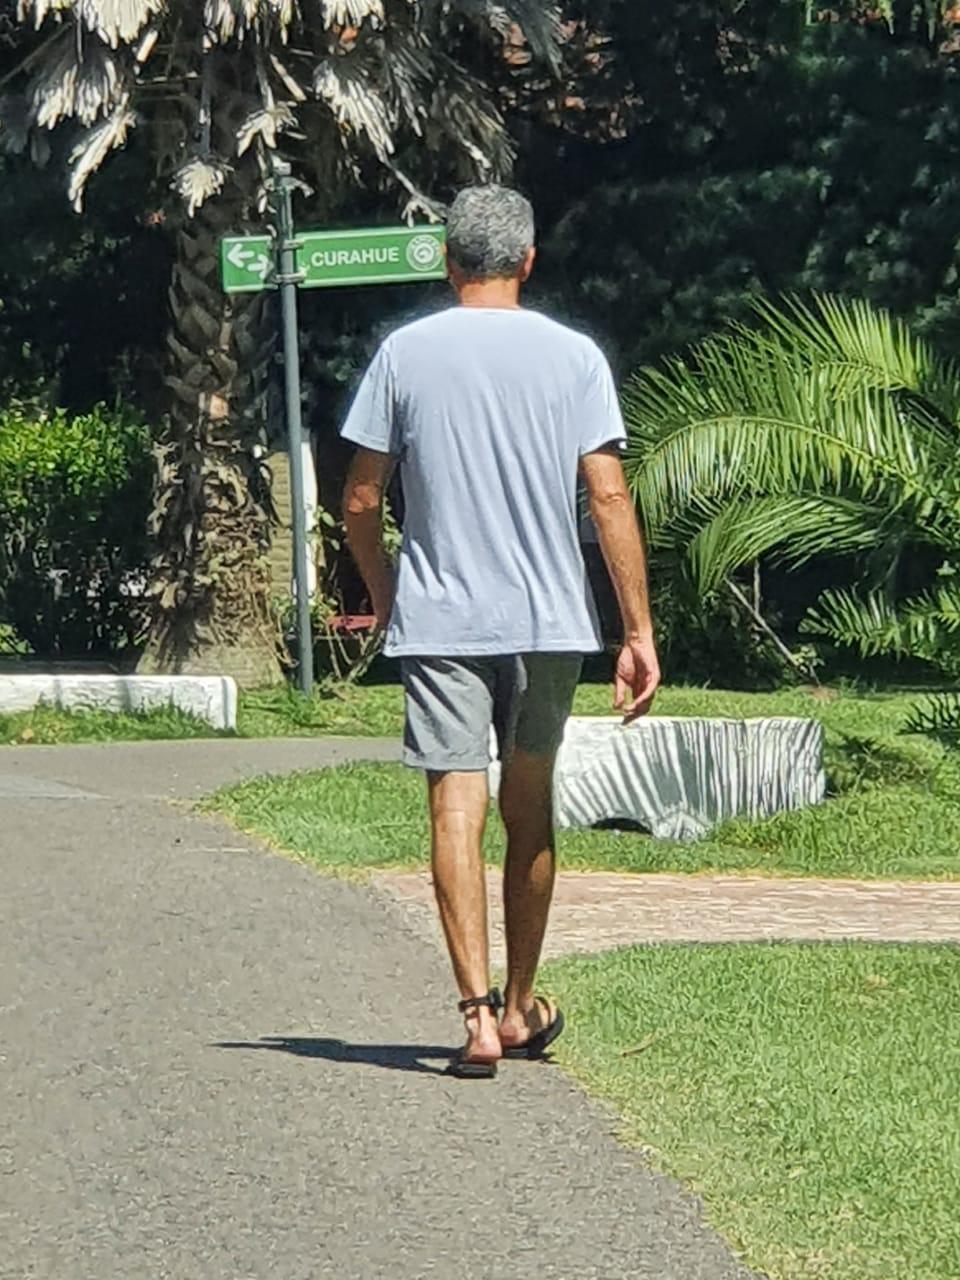 Roberto Baratta camina con la tobillera electrónica